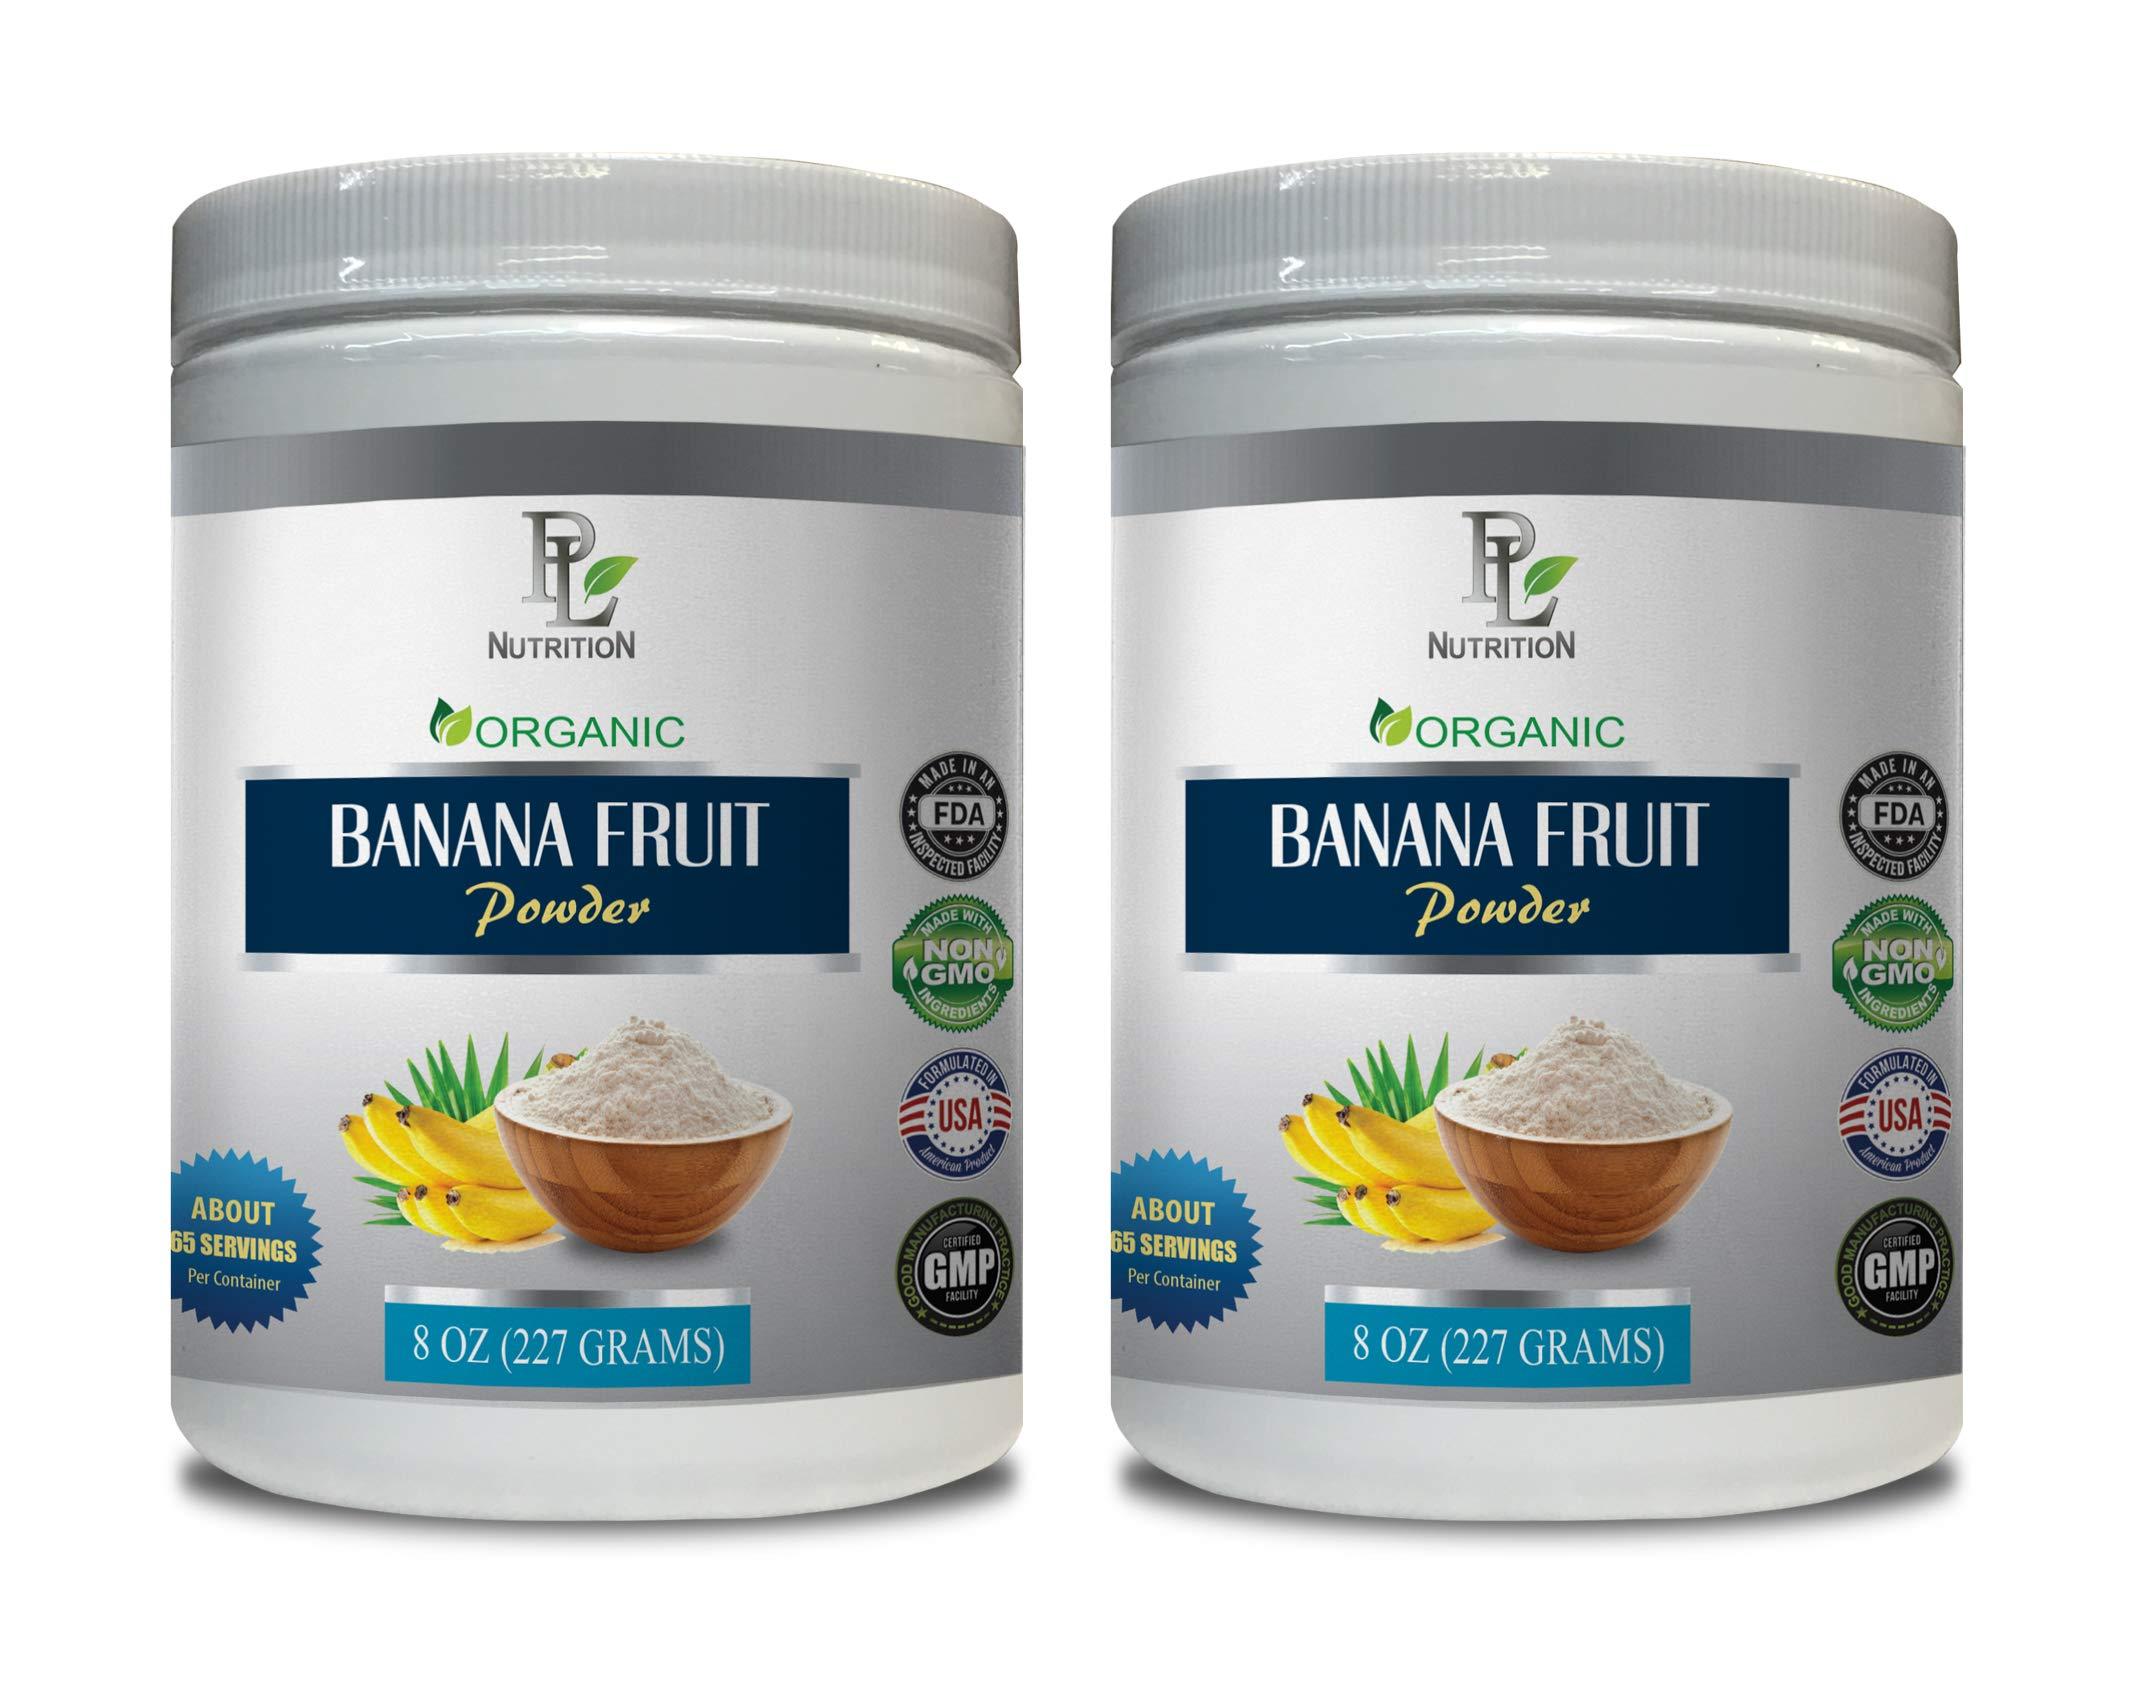 Energy Booster for Men - Banana Fruit - Organic Powder - Banana Extract Bulk - 2 Cans 16 OZ (130 Servings)